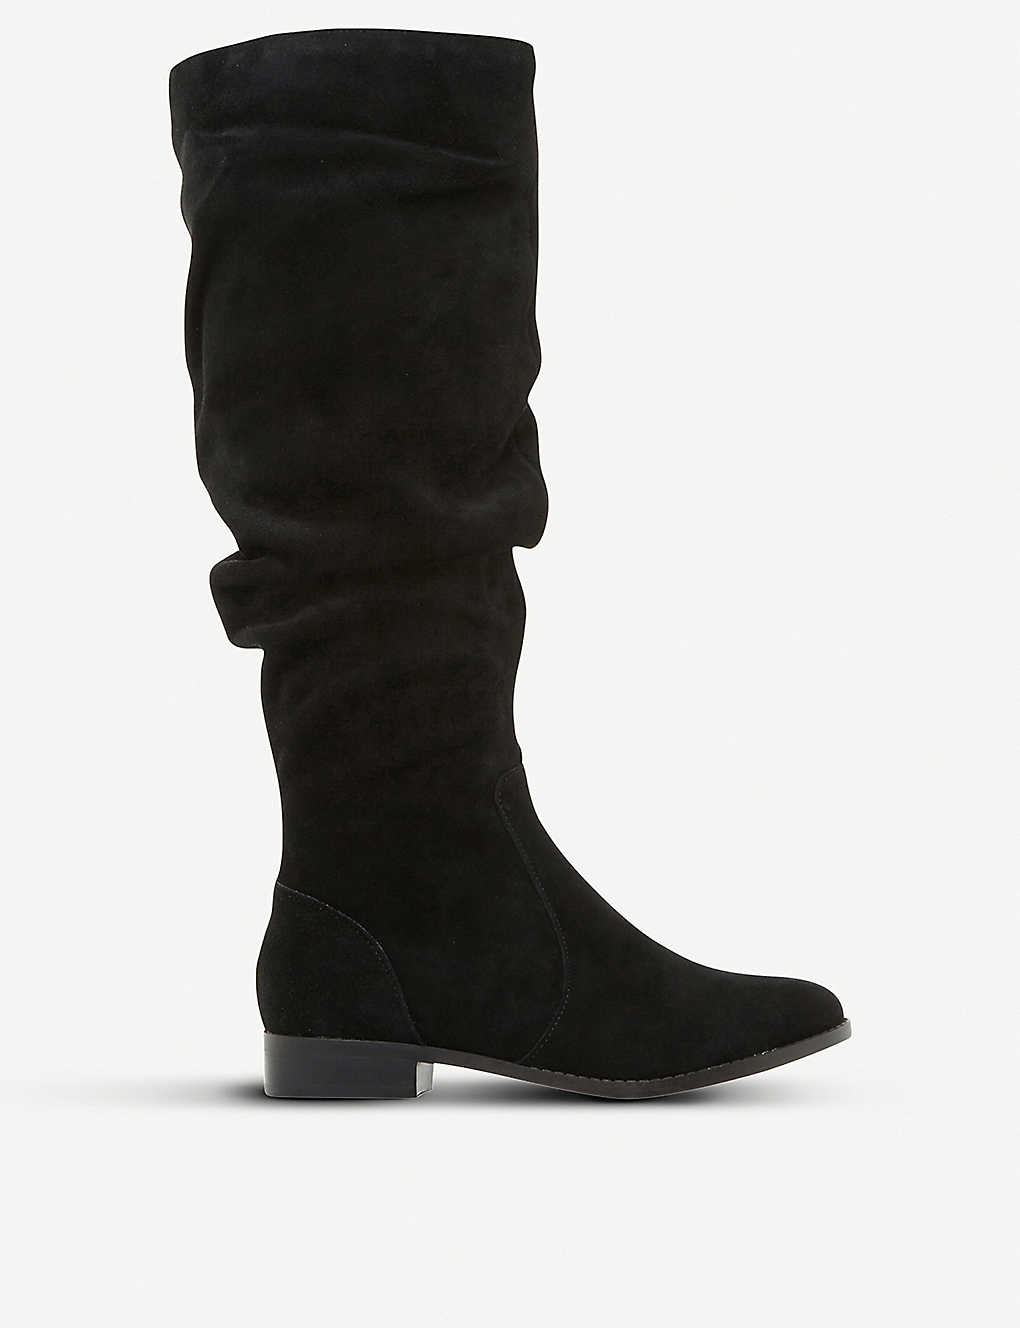 10abf251e8 STEVE MADDEN - Beacon SM suede boots | Selfridges.com